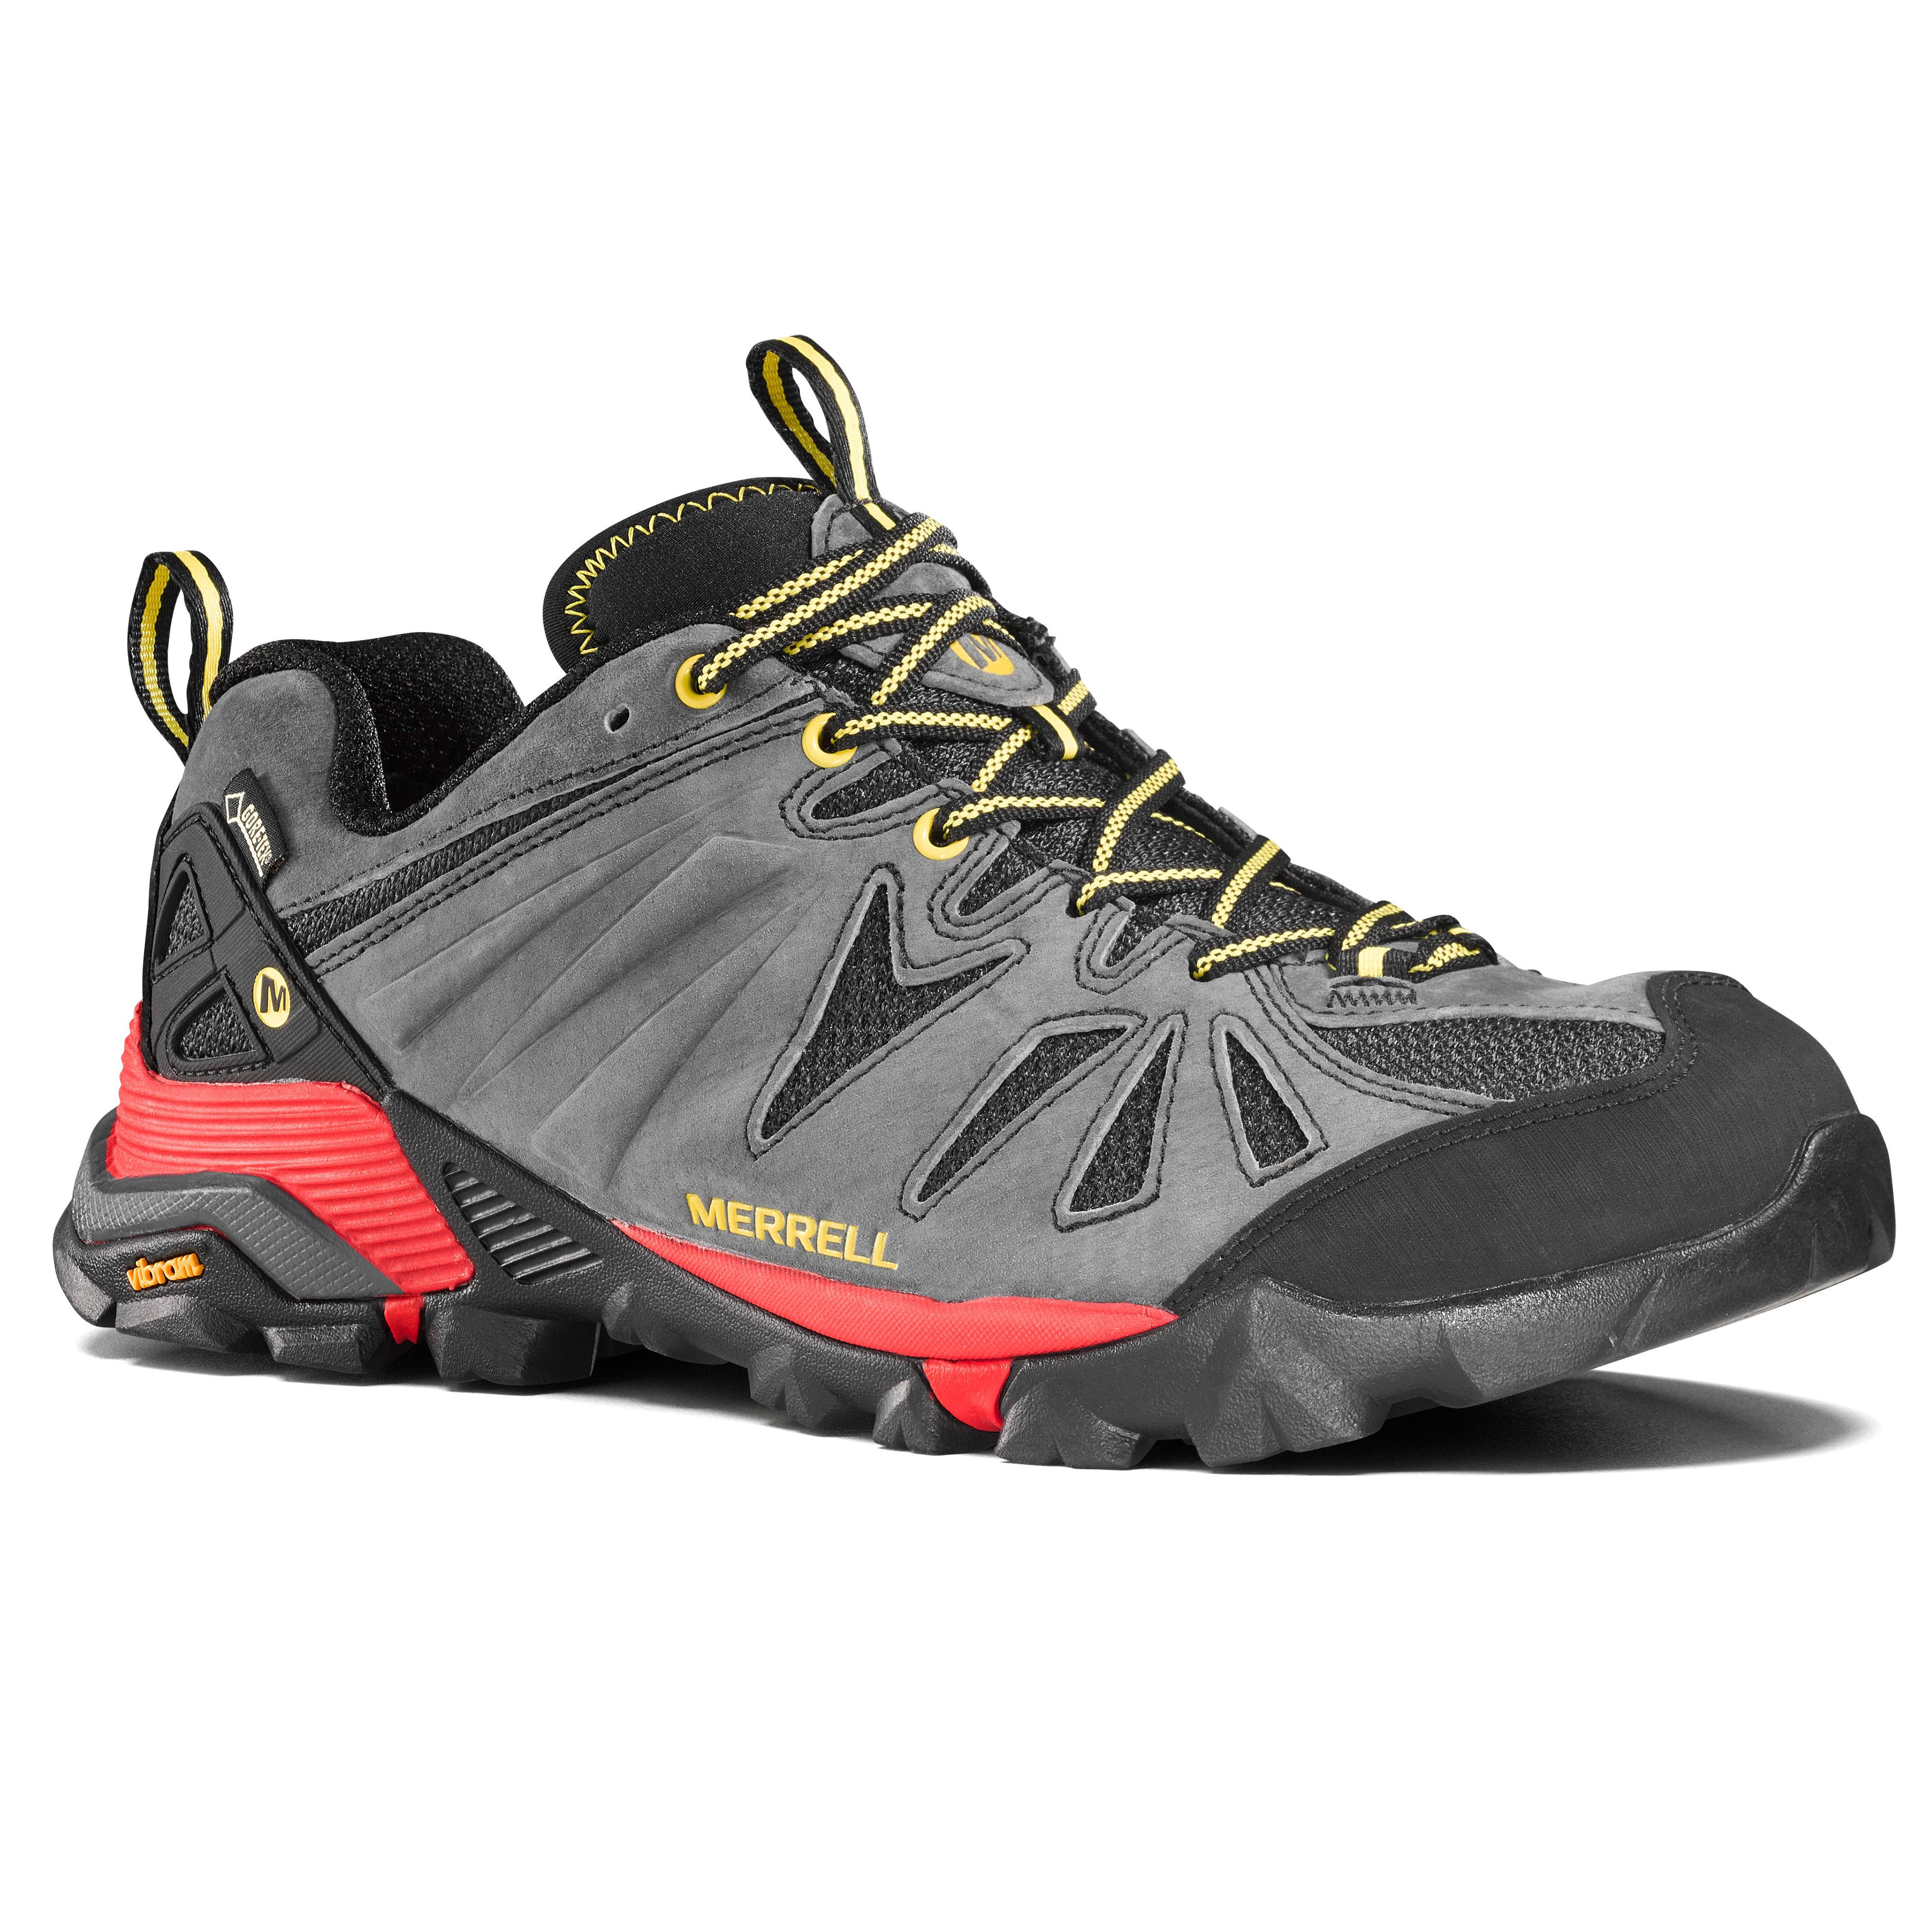 1bc7424375e Comprar Zapatillas de montaña y trekking hombre Merrell Capra Gore-Tex Gris  | Decathlon